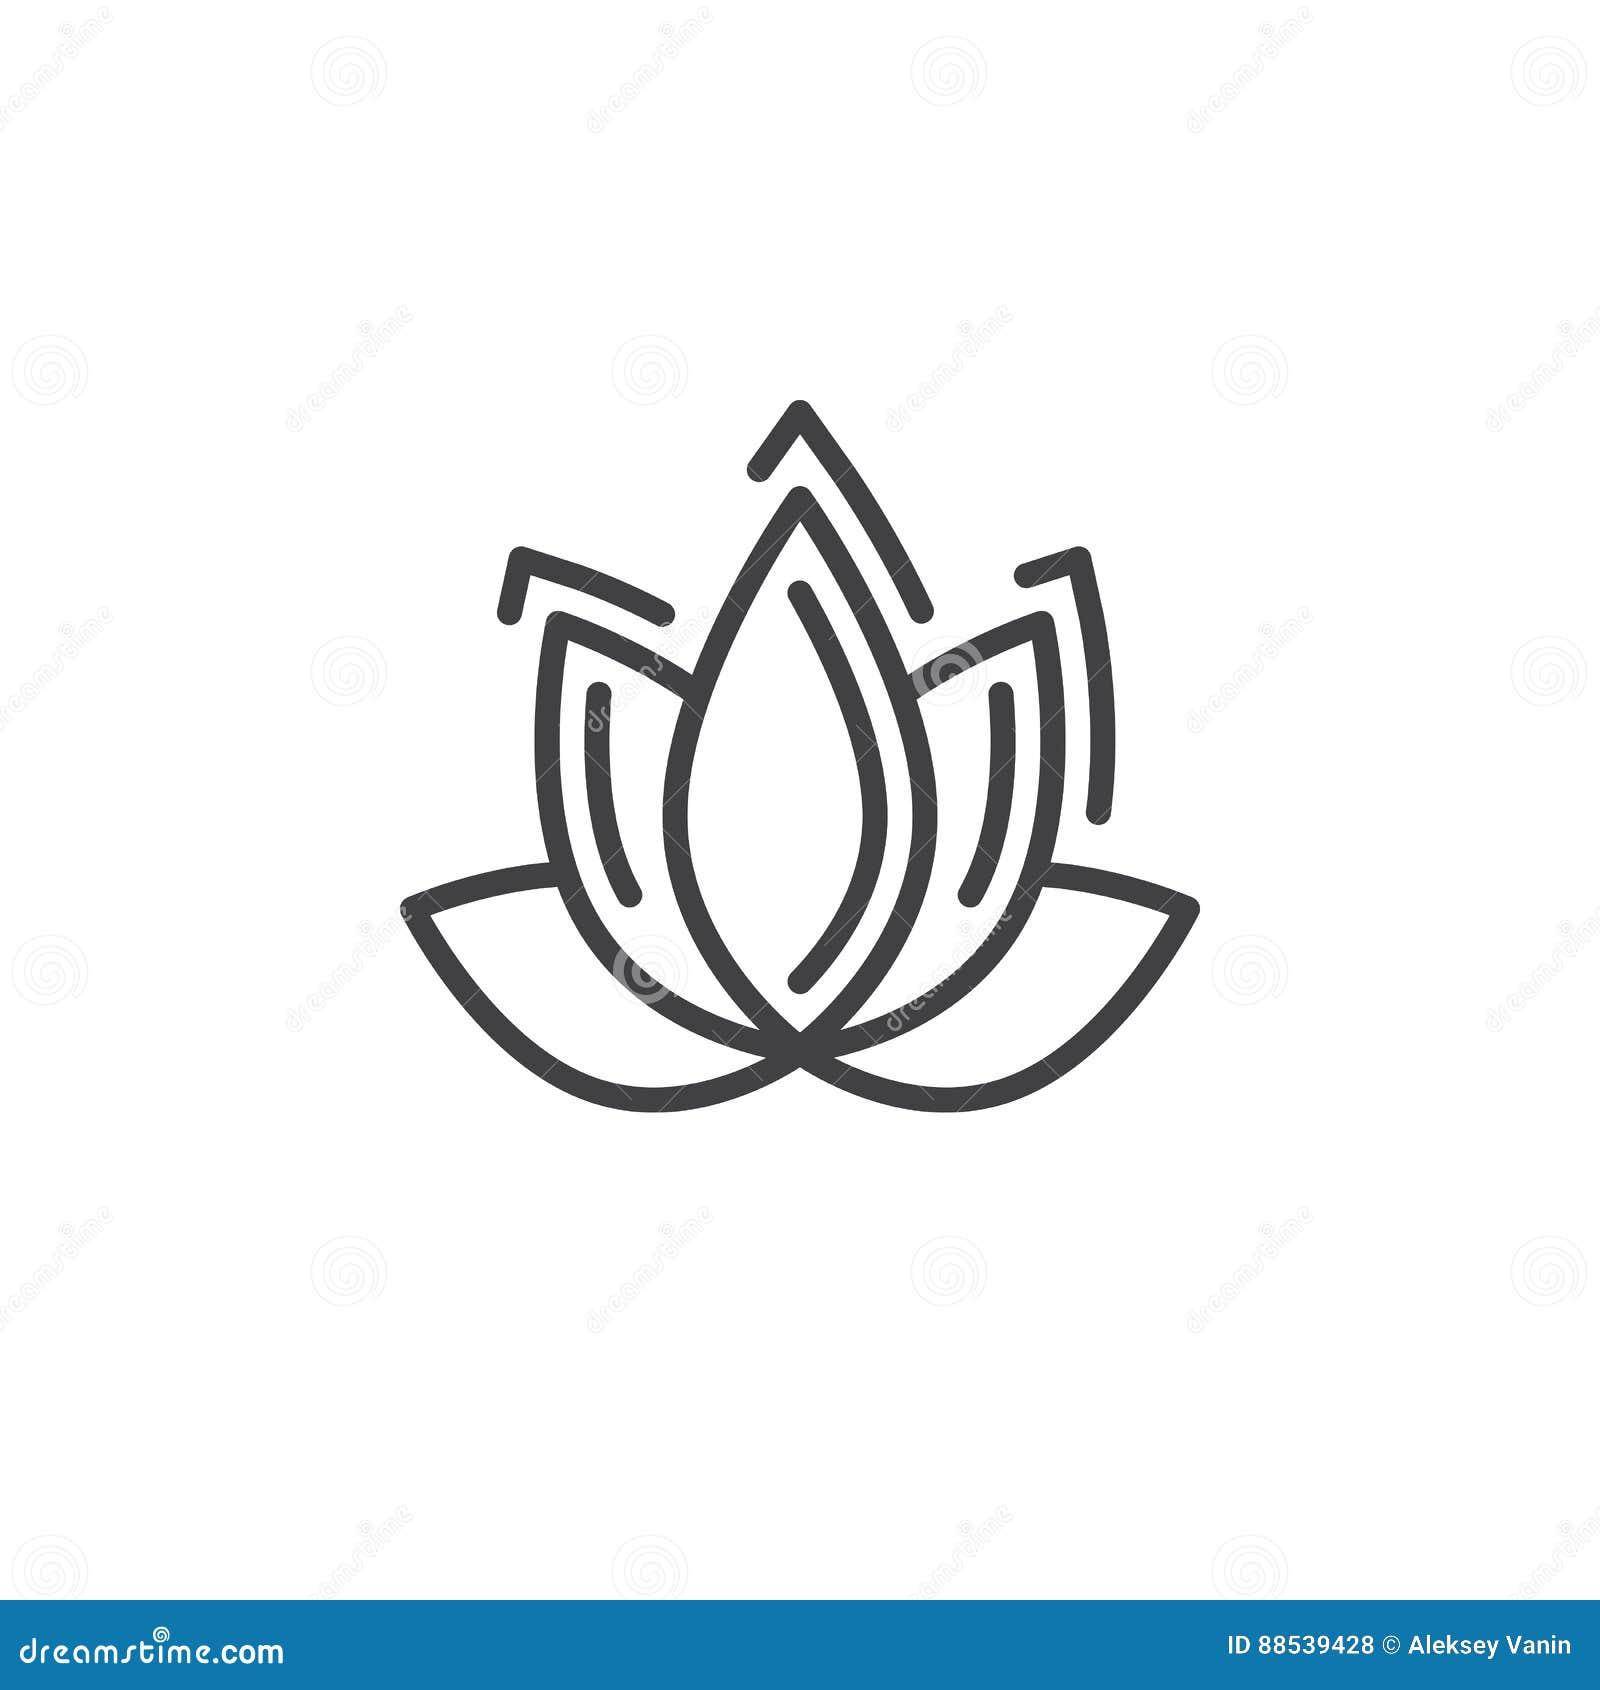 Lotus flower line icon outline vector sign linear pictogram download lotus flower line icon outline vector sign linear pictogram isolated on white stock izmirmasajfo